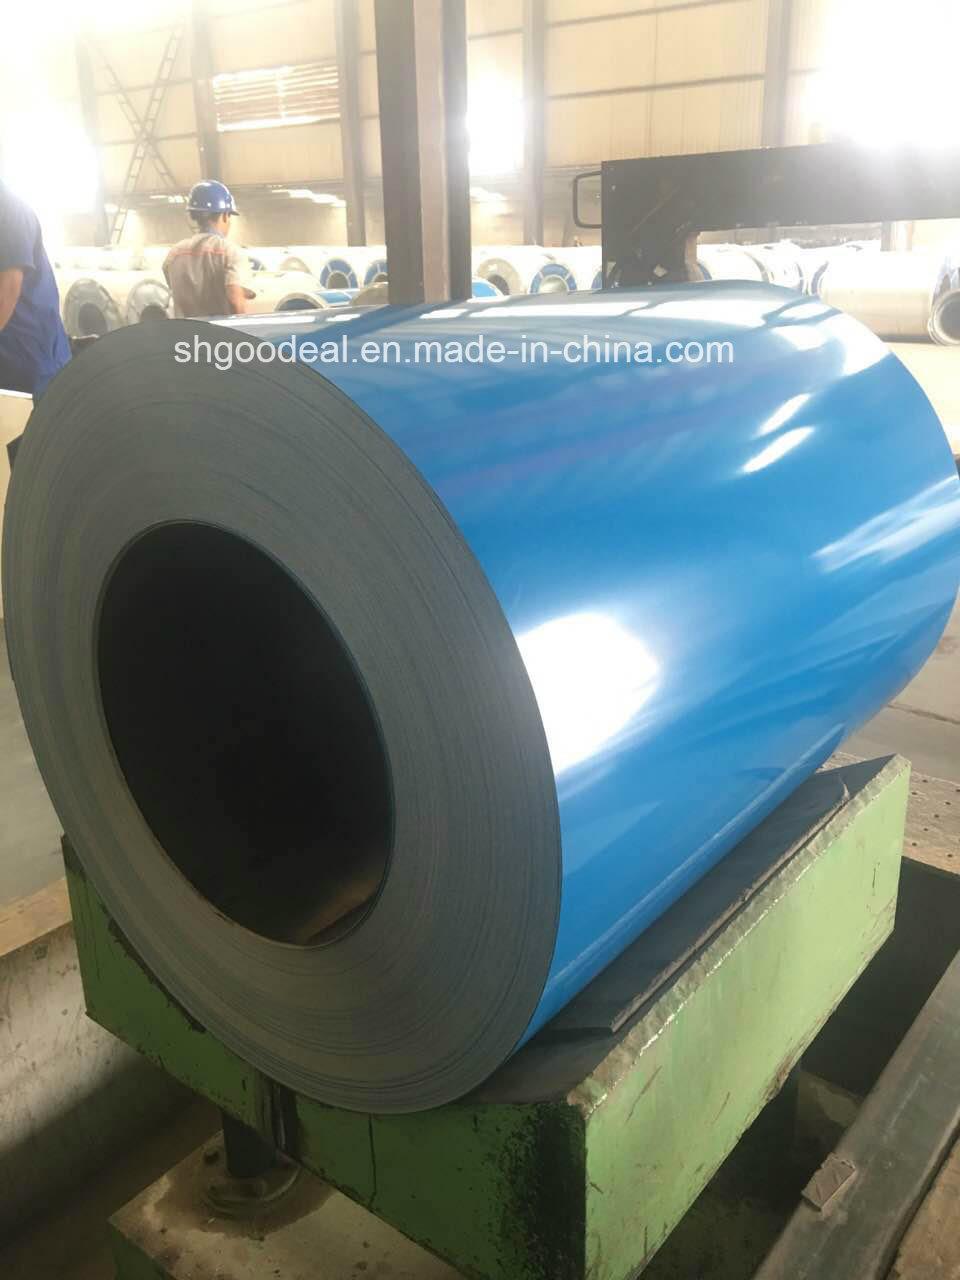 Corrugated Prepainted Galvanized PPGI Steel Roofing